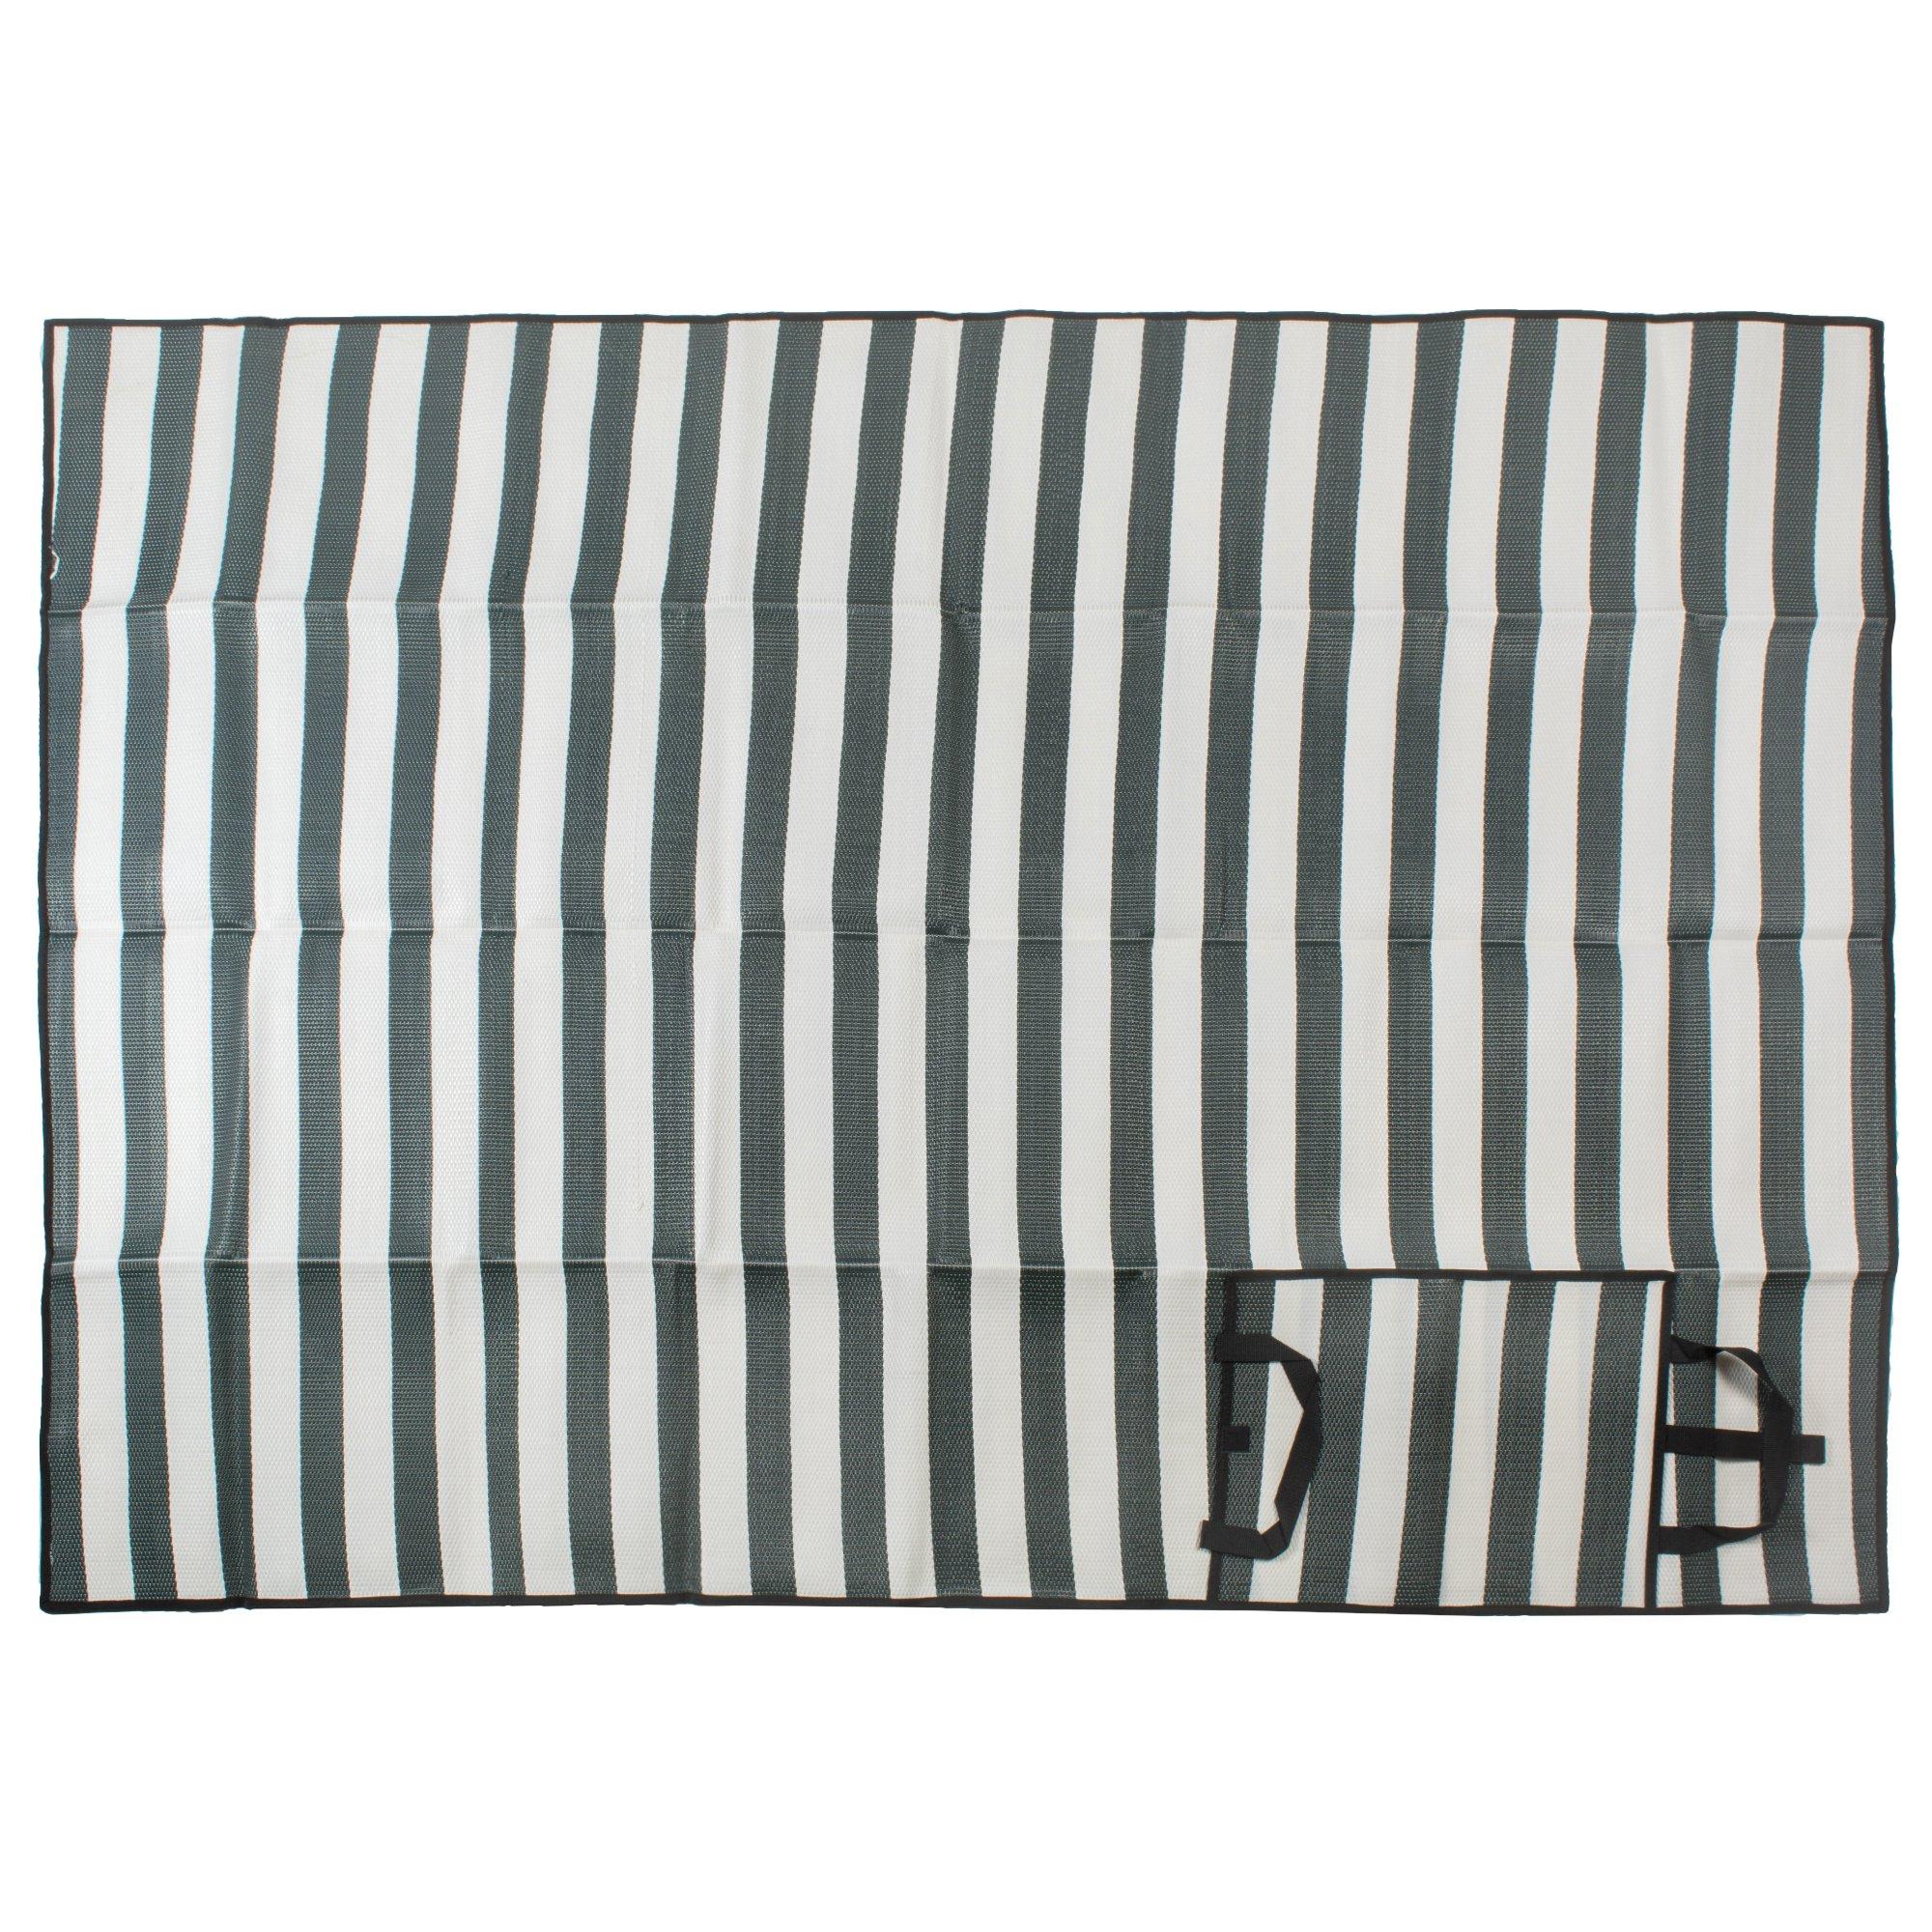 J & M Home Fashions Cabana Stripe Picnic Mat, 60x78, Dark Green by J&M Home Fashions